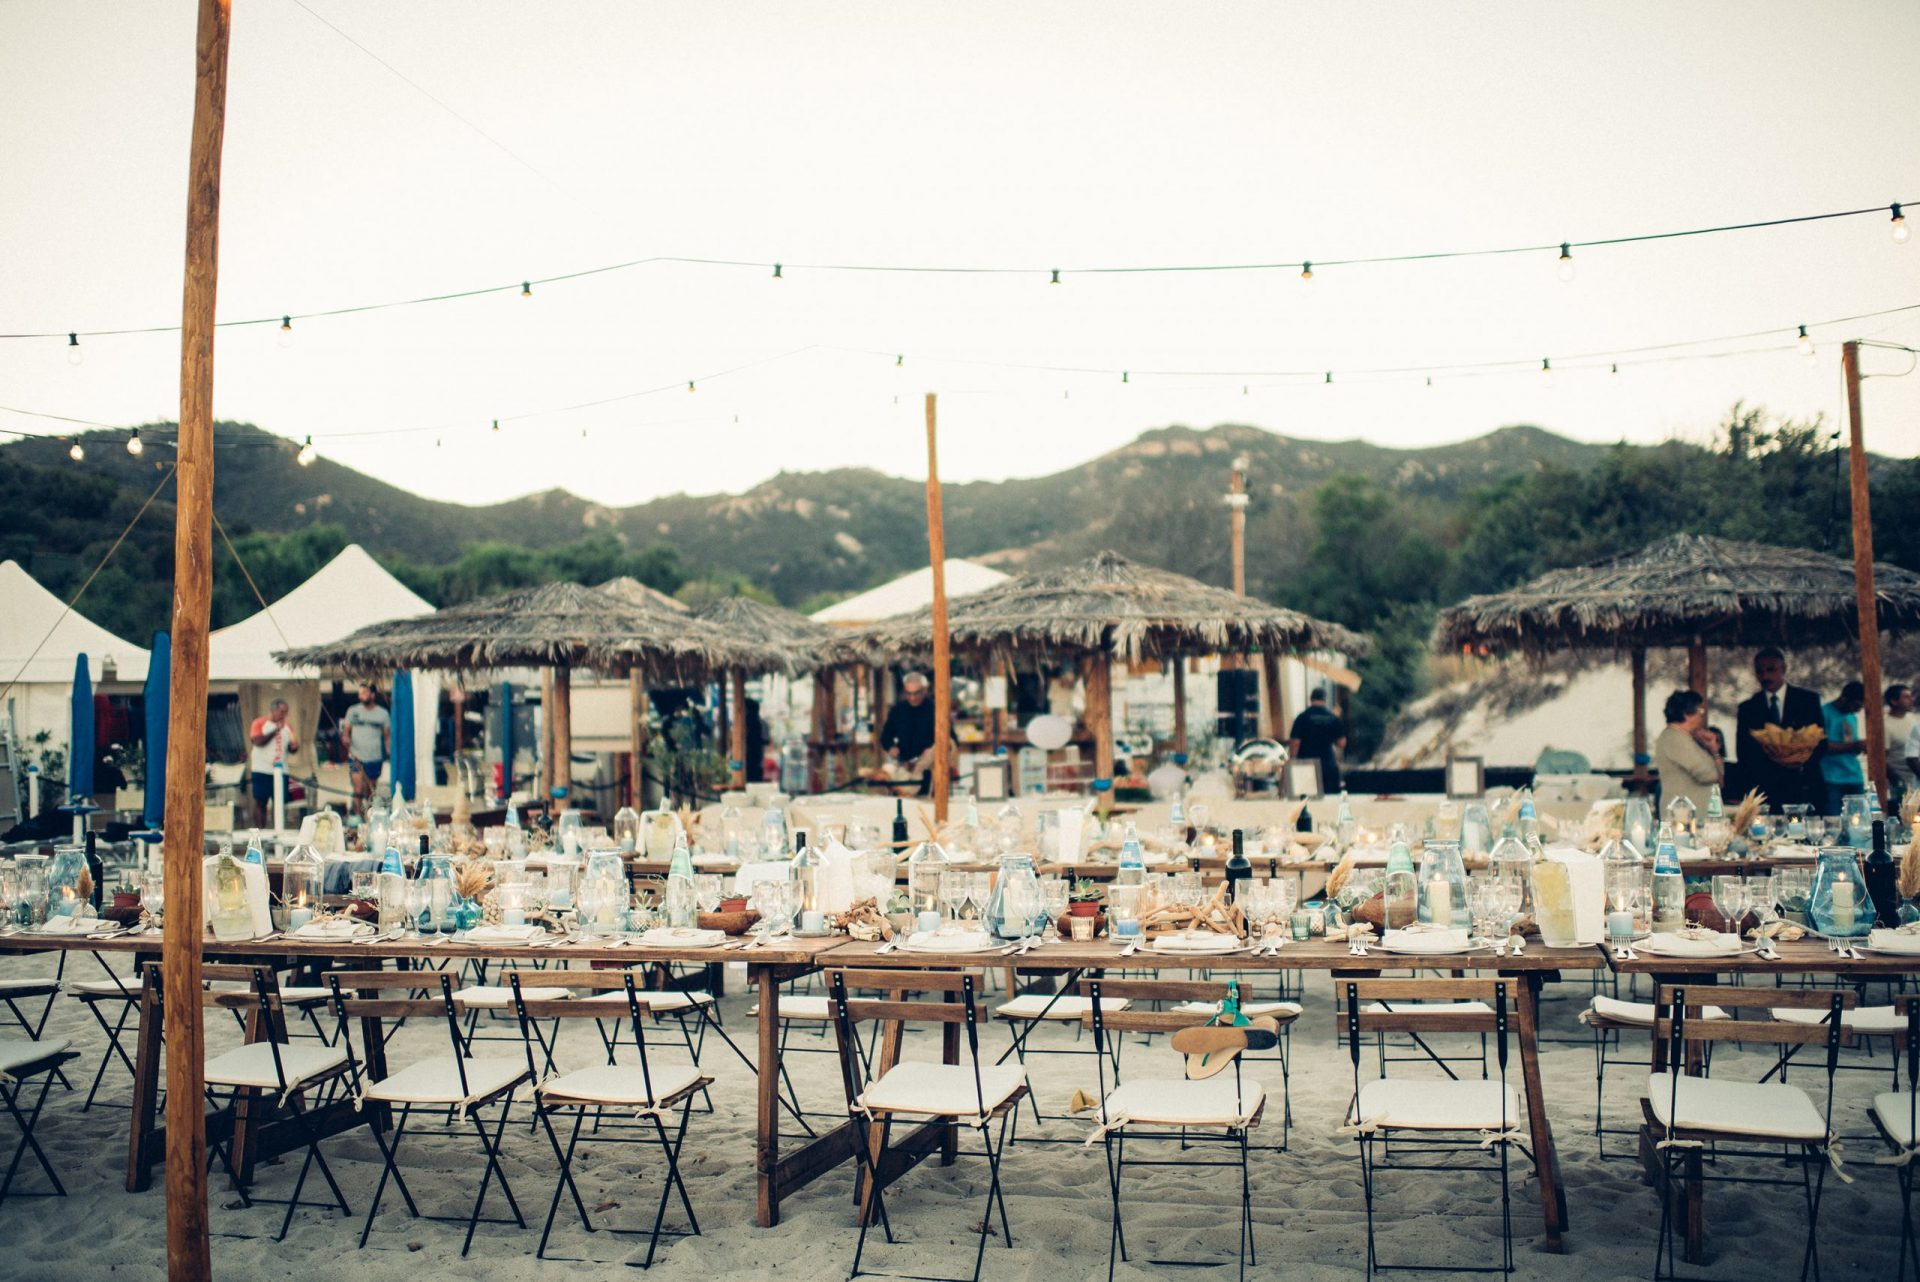 Mario and Mery, wedding long table on the beach